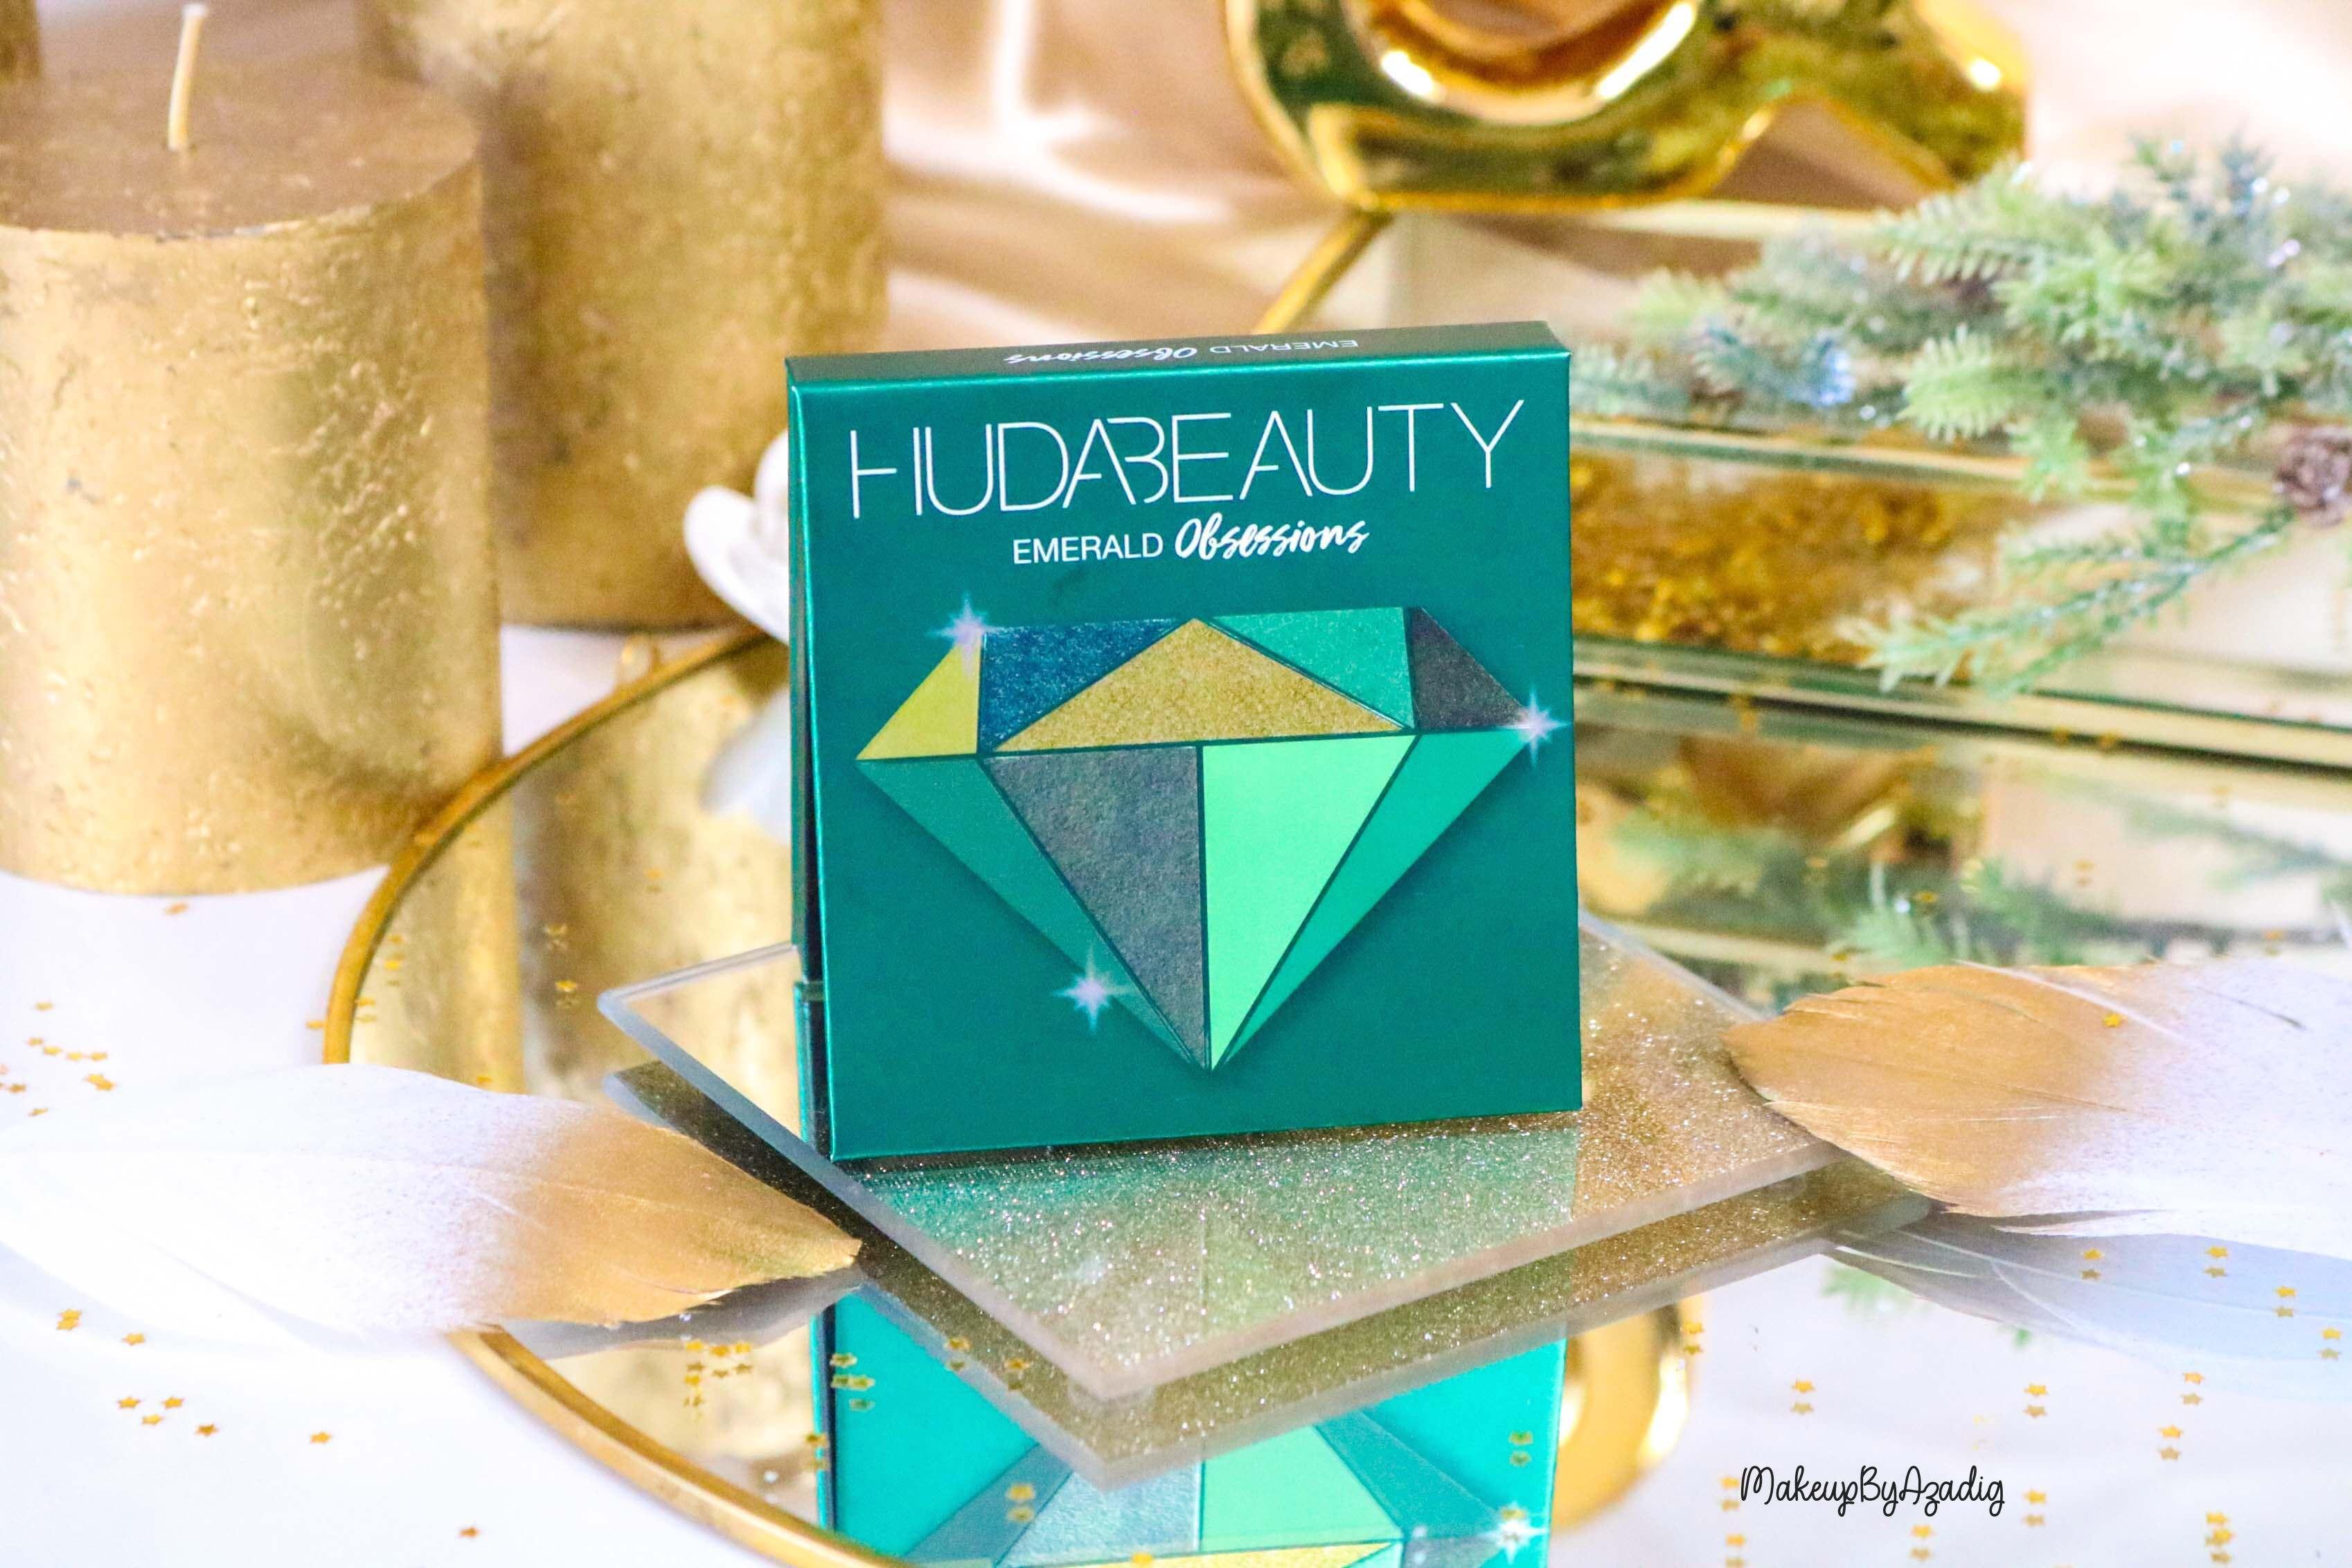 revue-review-palette-emerald-obsessions-huda-beauty-topaz-sapphire-avis-prix-swatch-makeupbyazadig-meilleure-emeraude